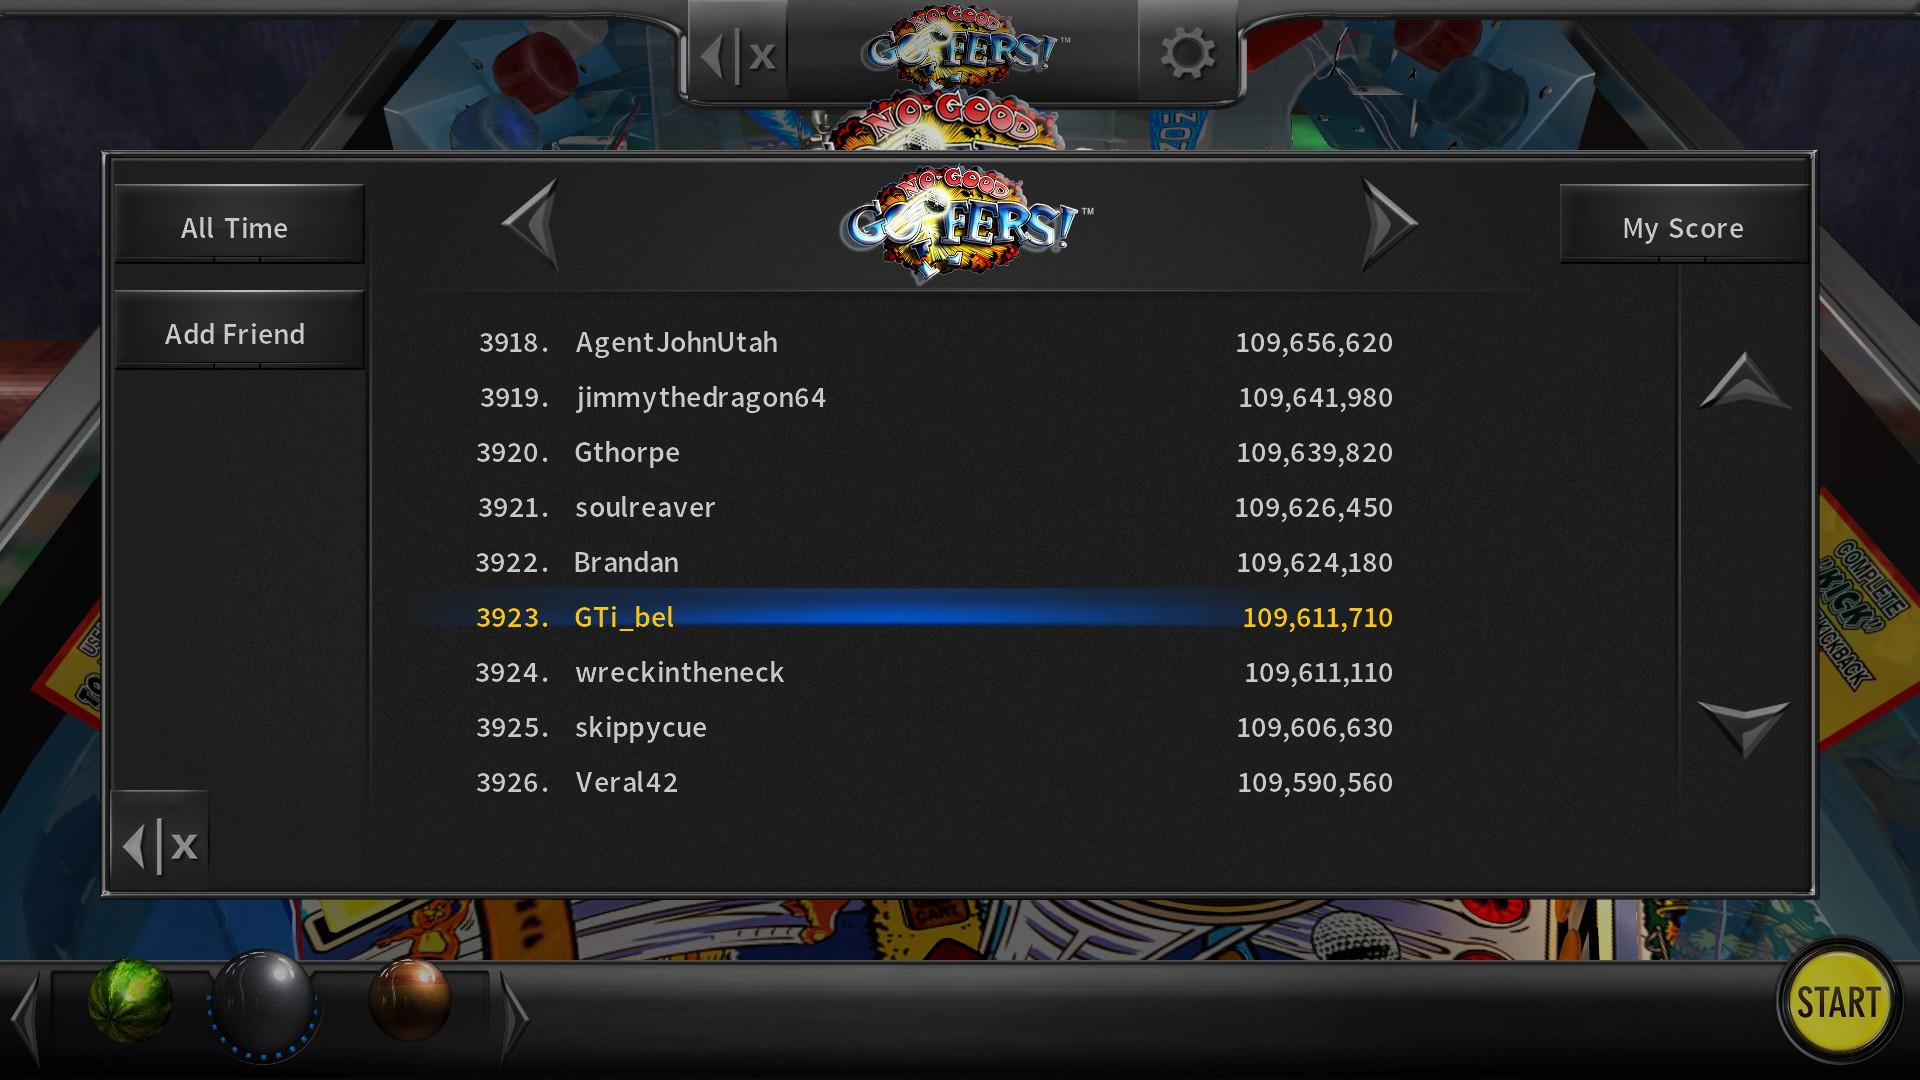 Pinball Arcade: No Good Goofers 109,611,710 points